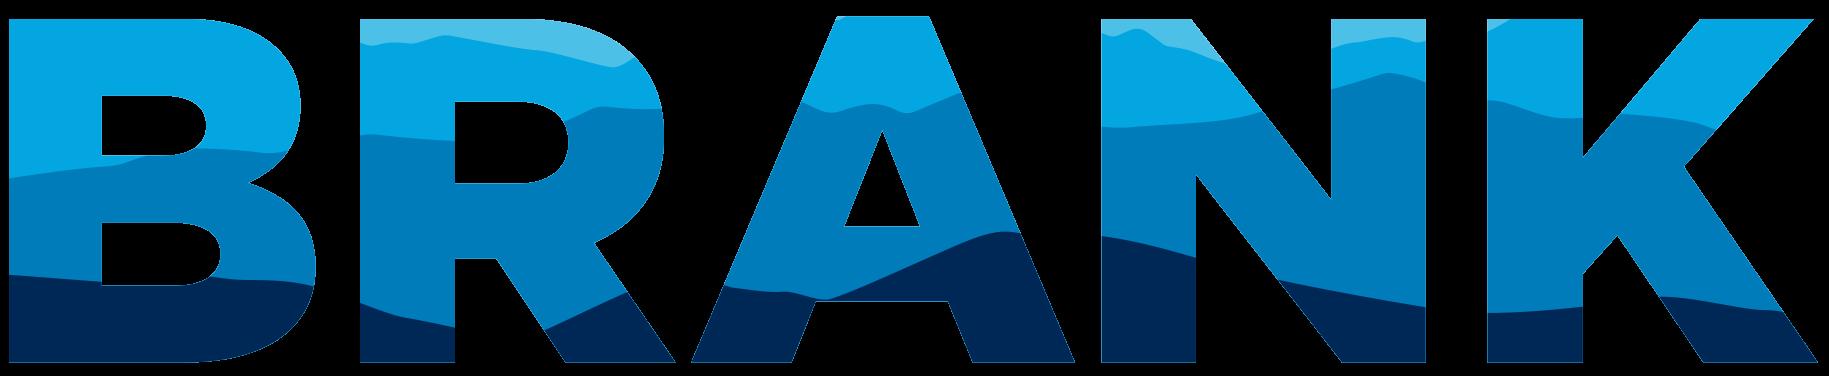 Brank-color-word logo